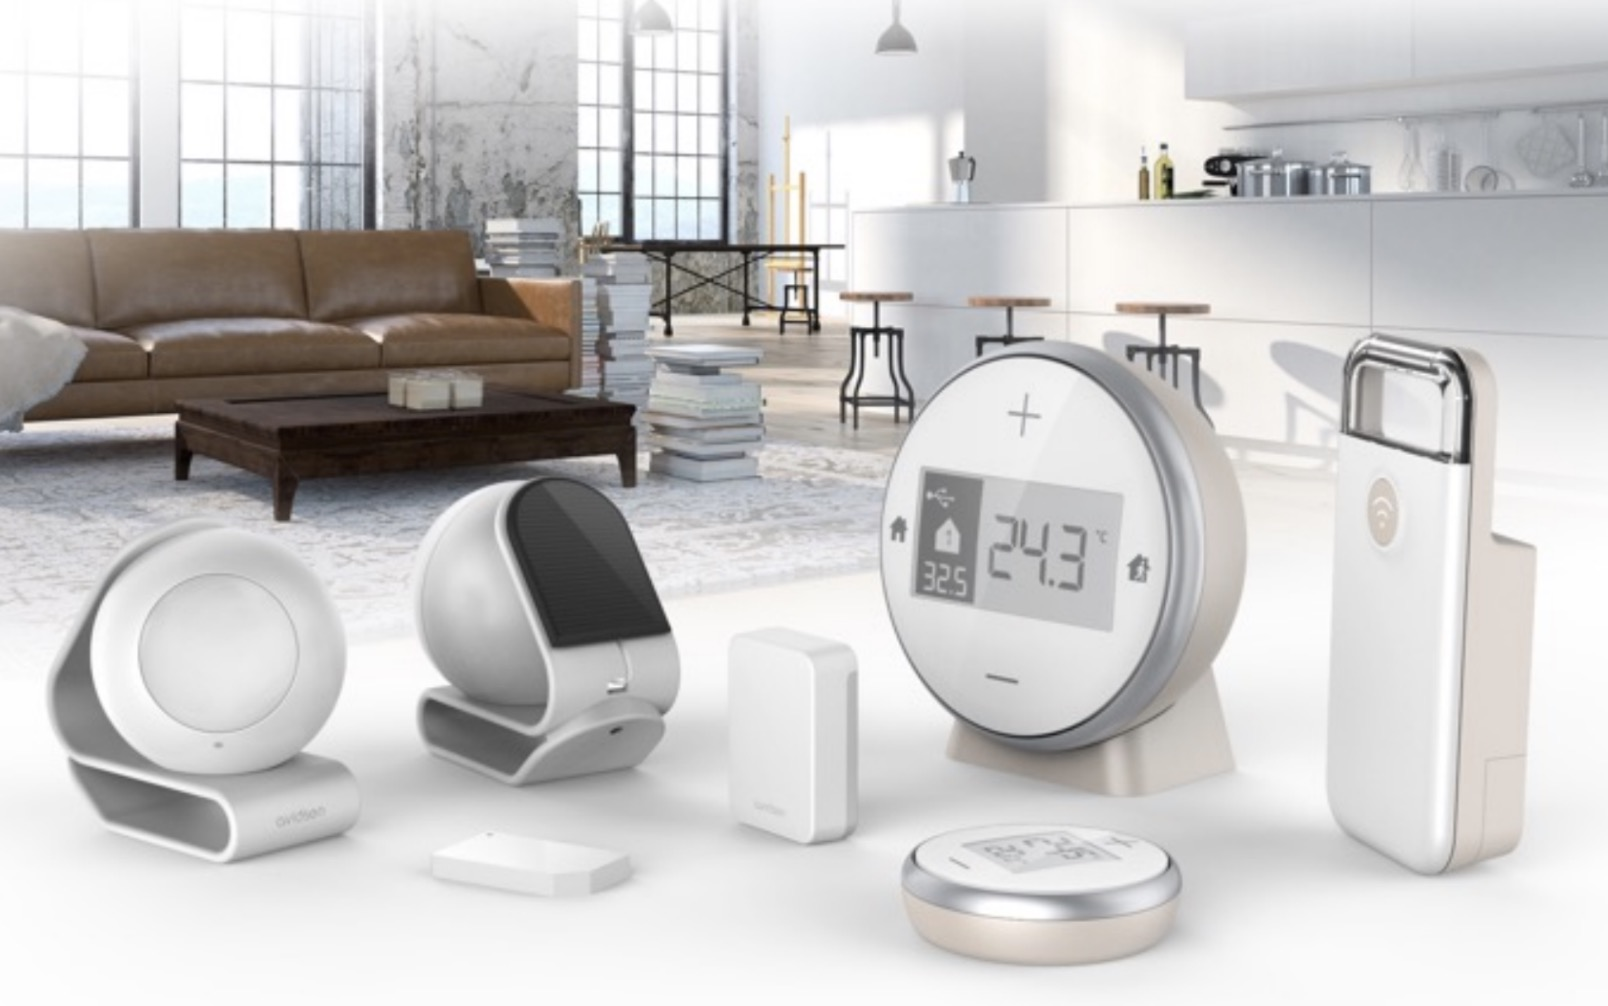 avec mod avidsen invente la premi re gamme d objets connect s multi protocoles. Black Bedroom Furniture Sets. Home Design Ideas